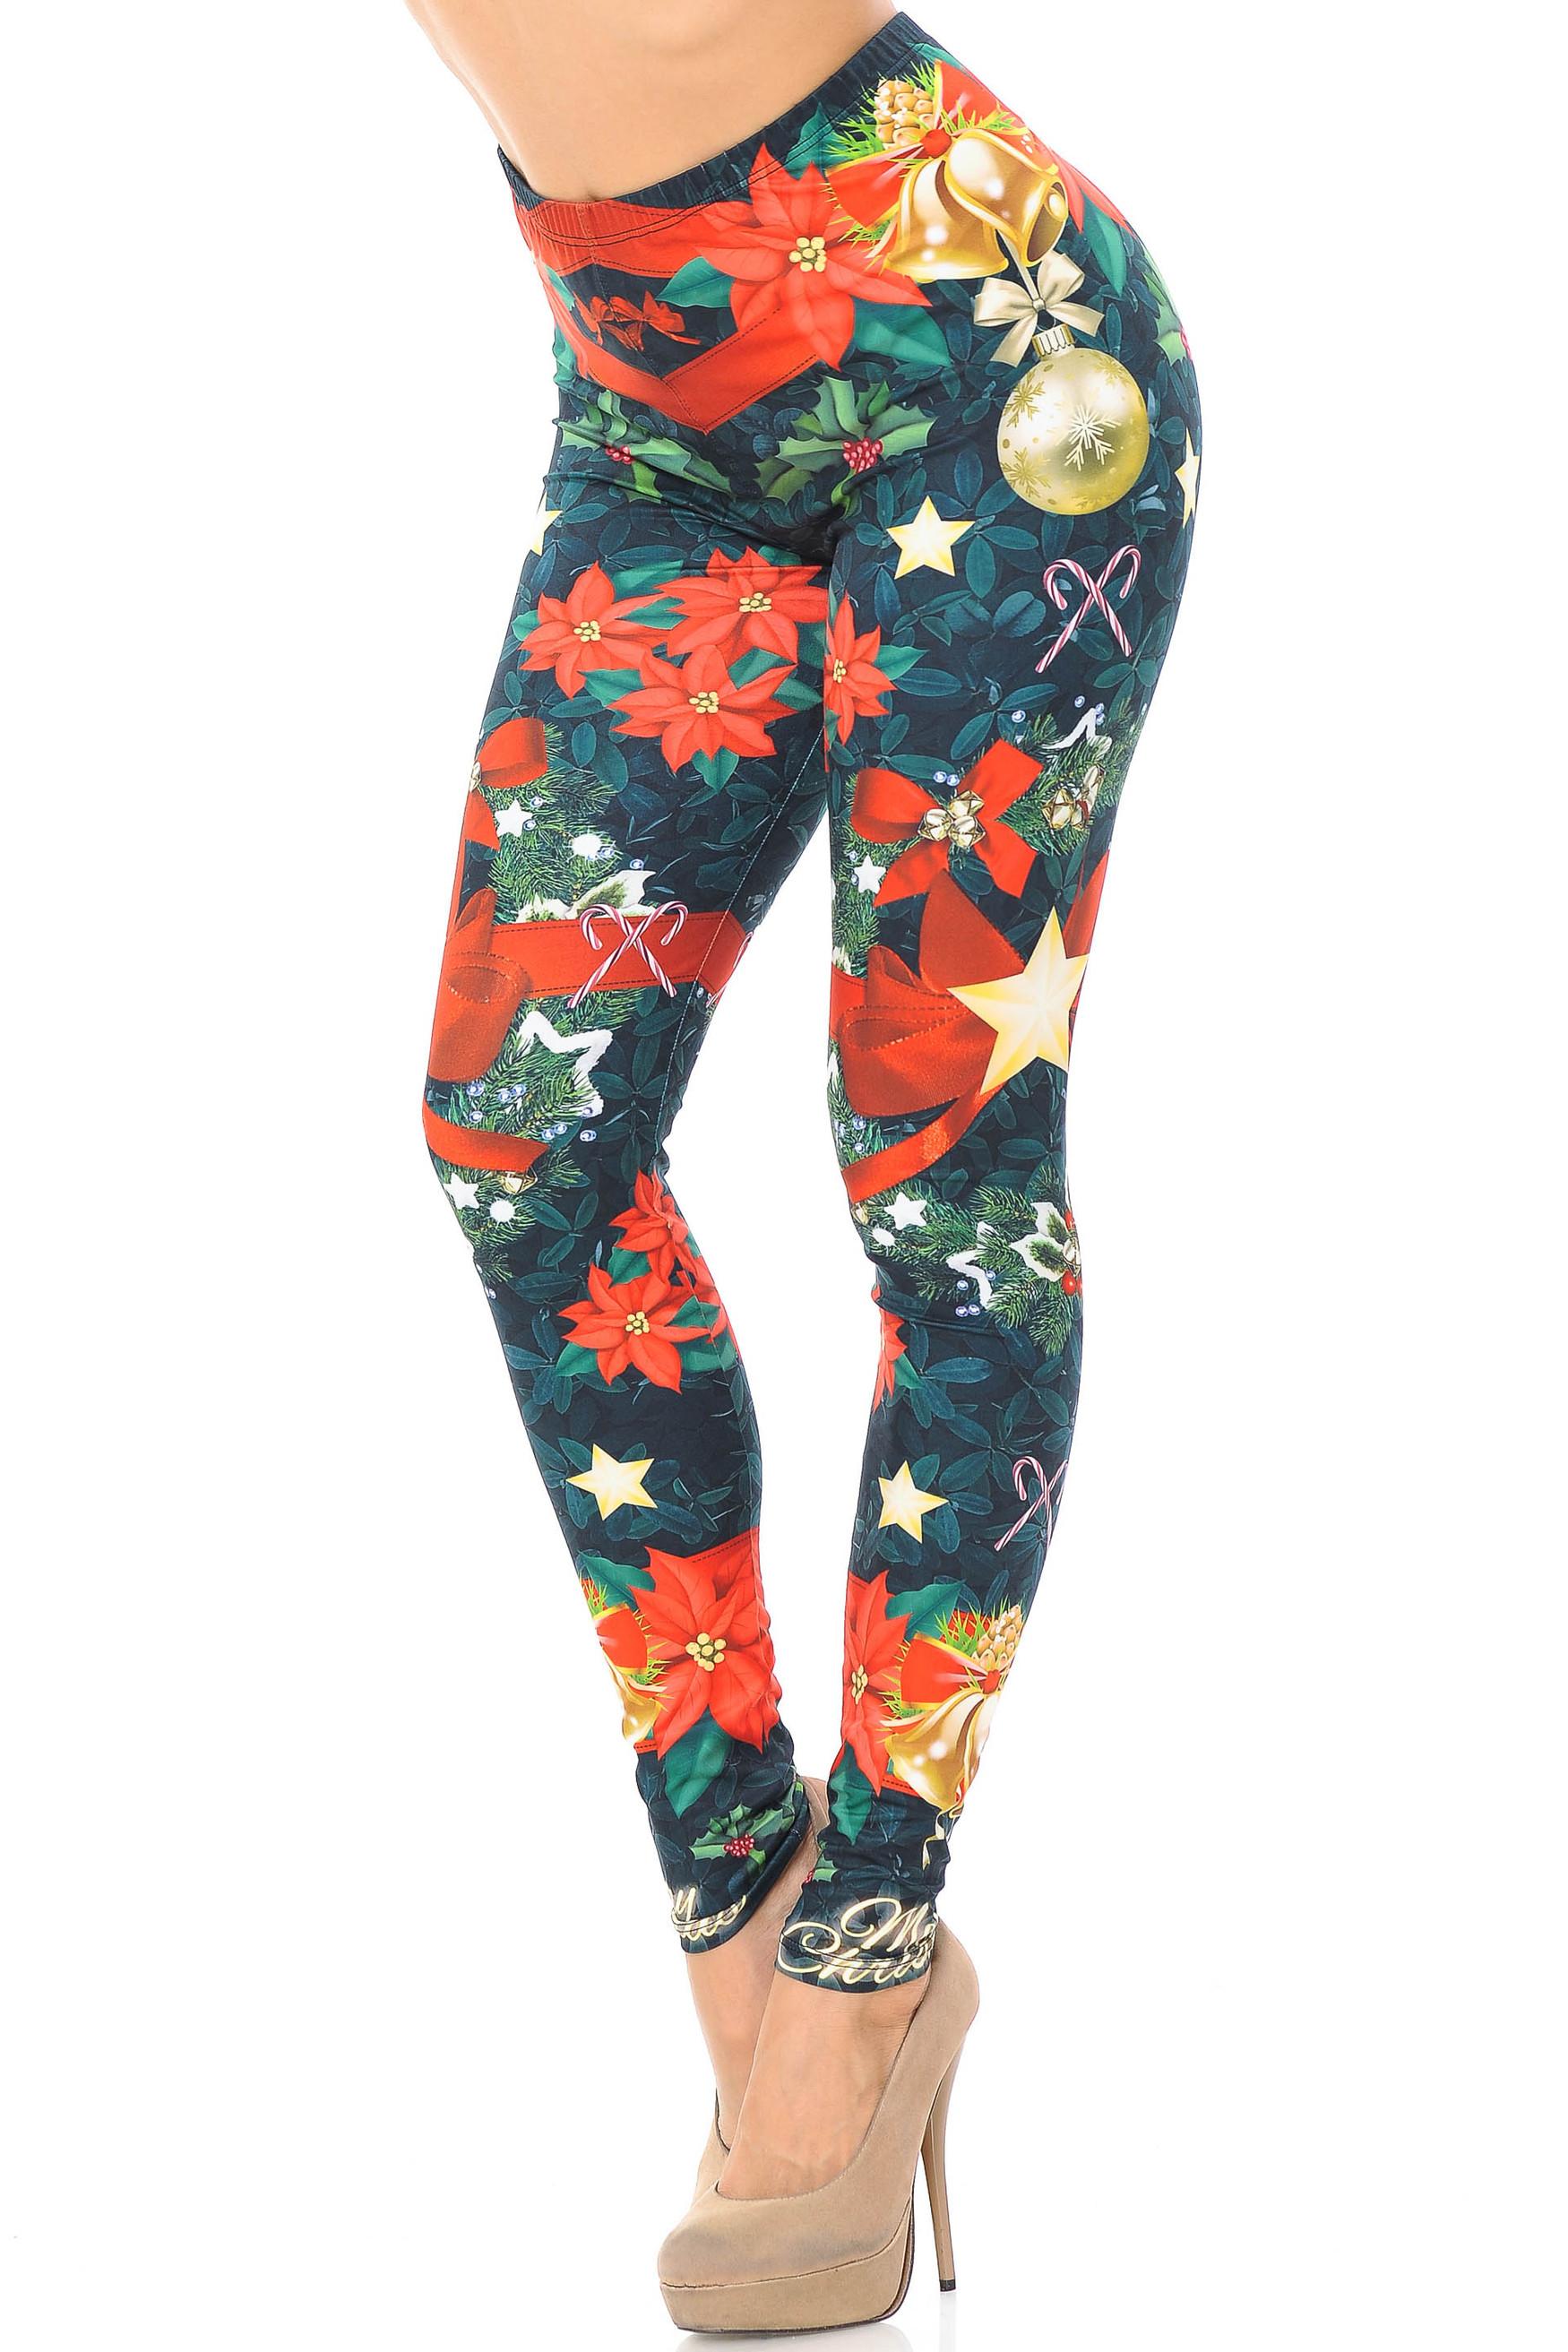 Creamy Soft Christmas Bows and Wreath Leggings - USA Fashion™